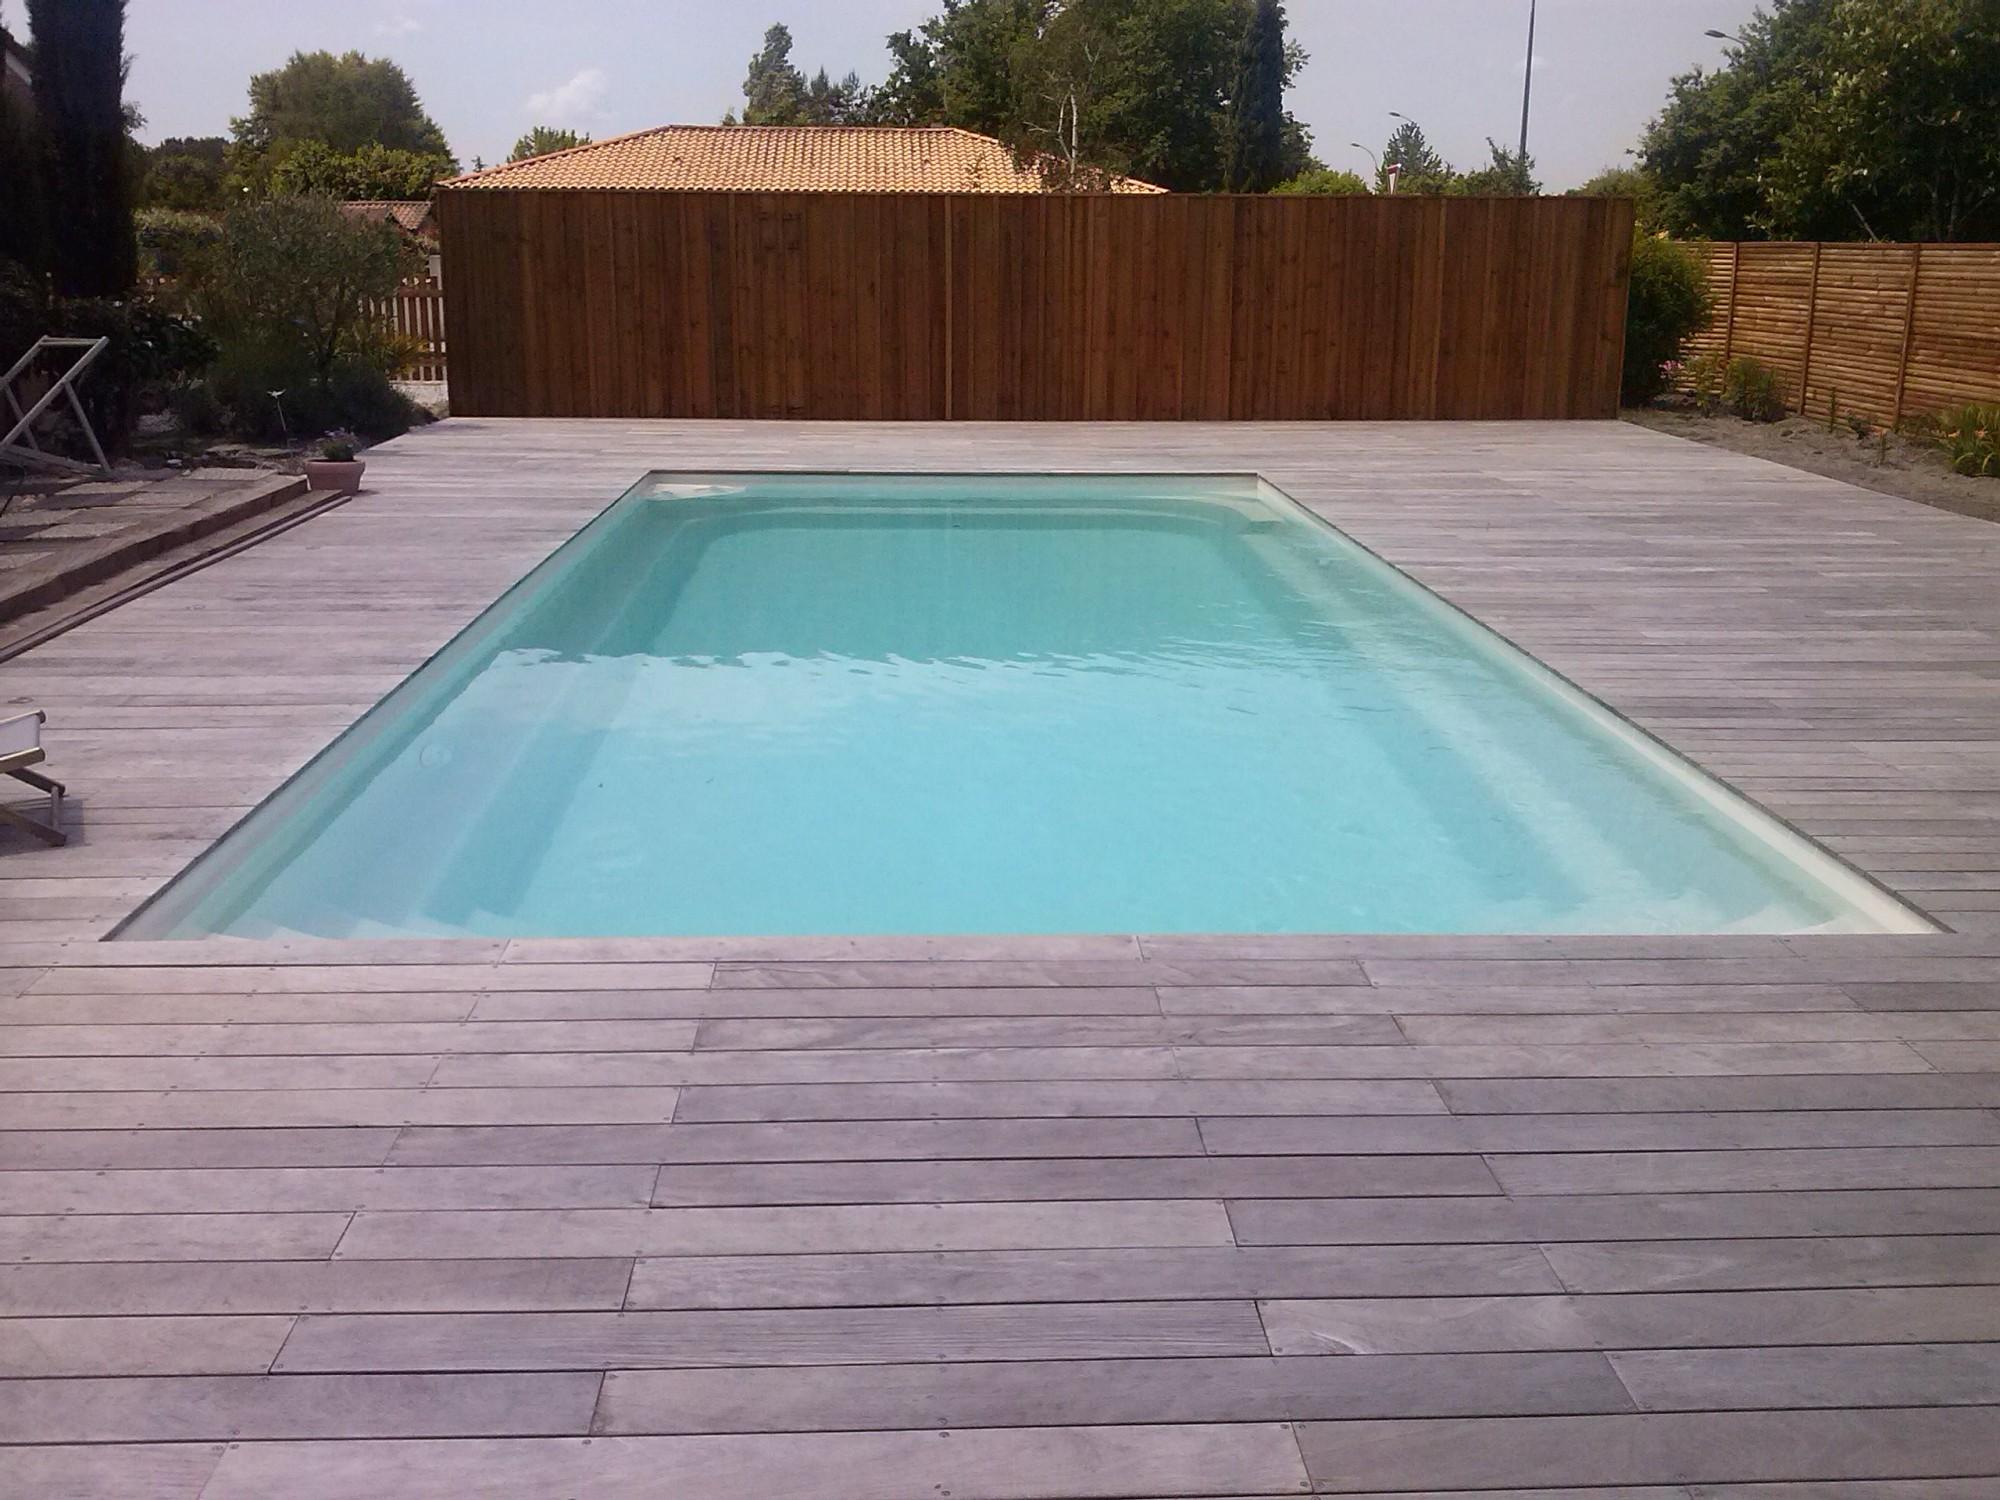 terrasse bois exotique piscine nos conseils. Black Bedroom Furniture Sets. Home Design Ideas